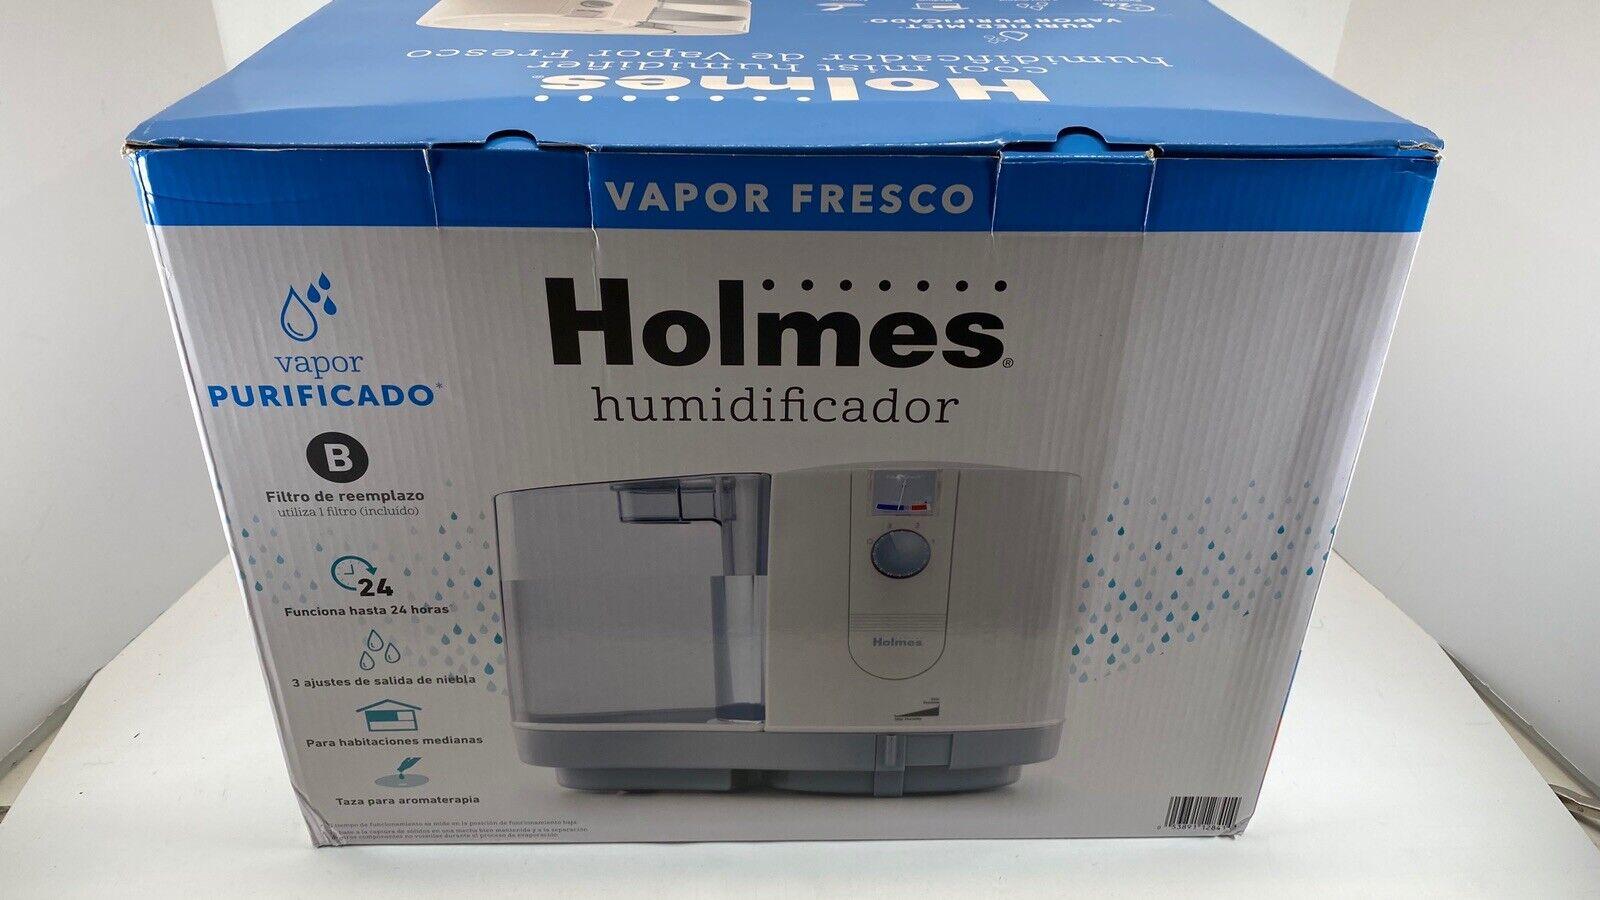 Holmes Humidifier HM 1700.